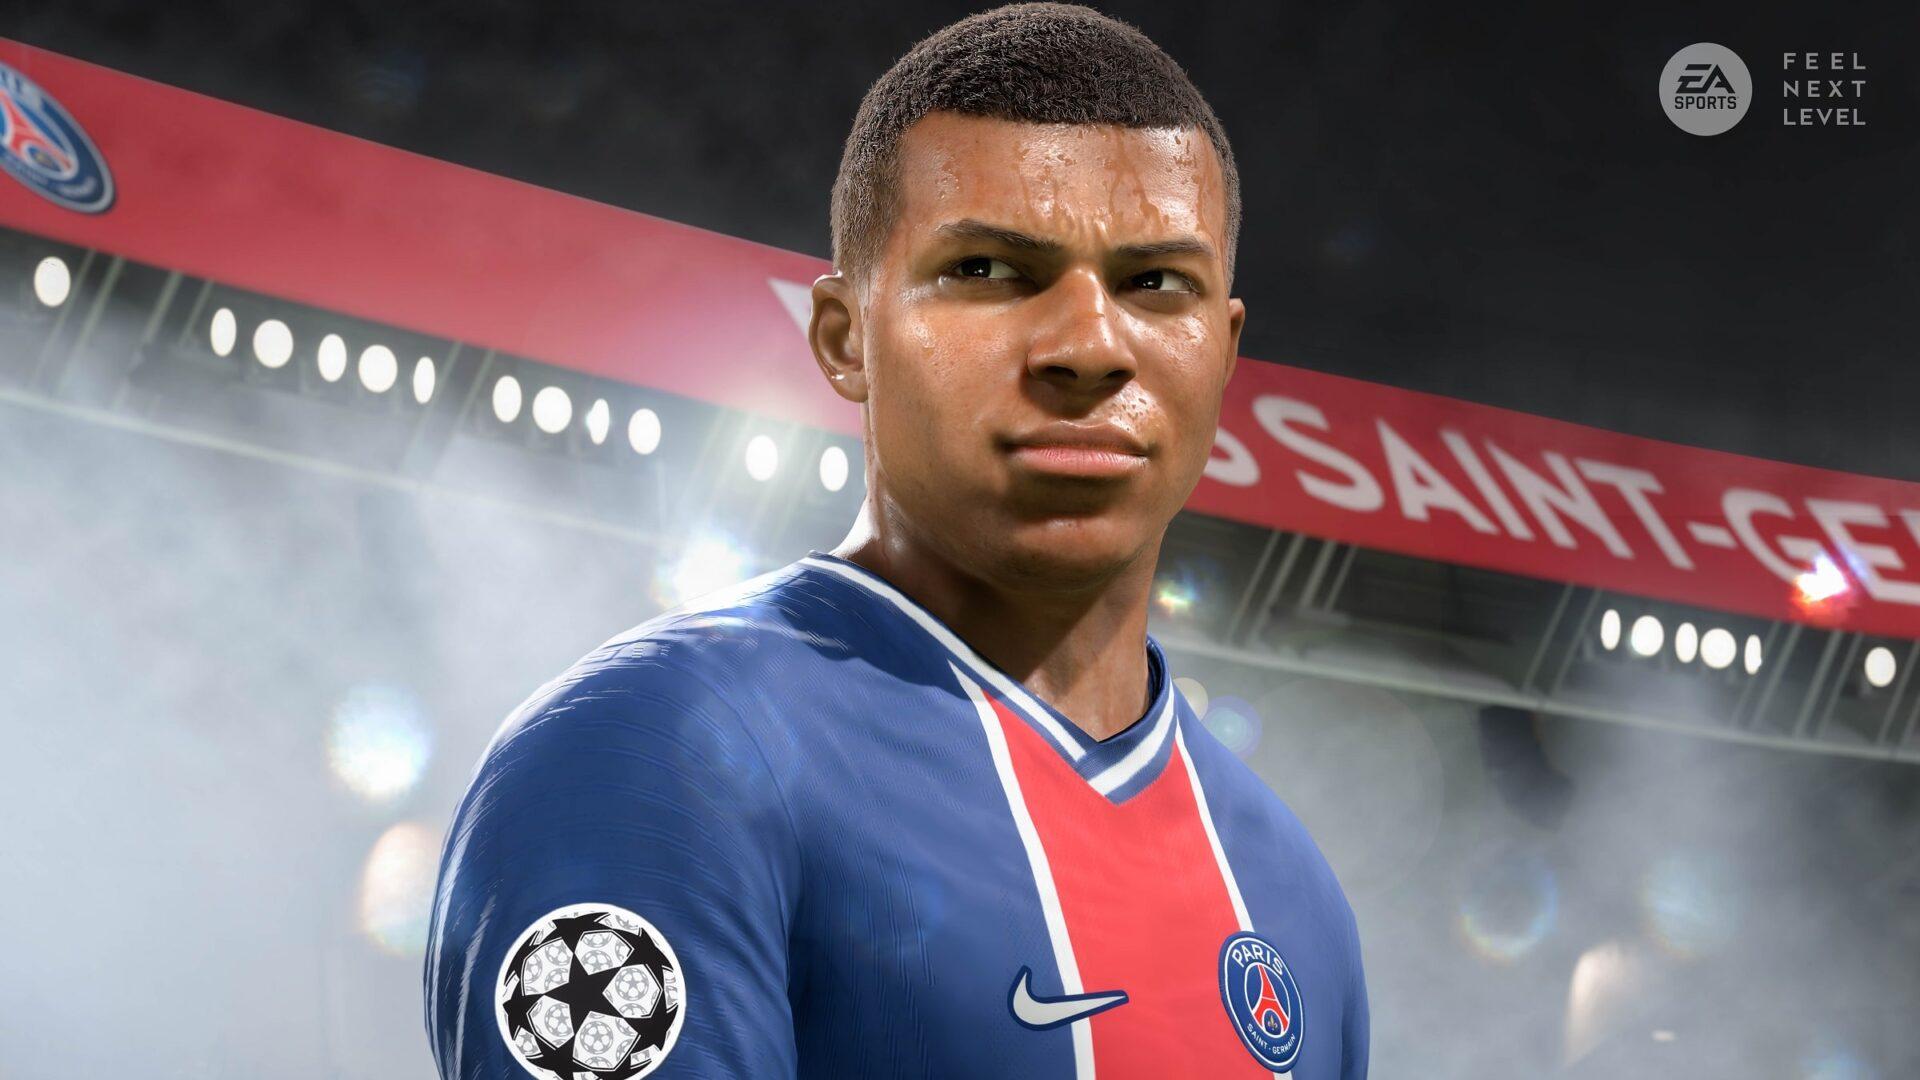 loyalty in FIFA 22